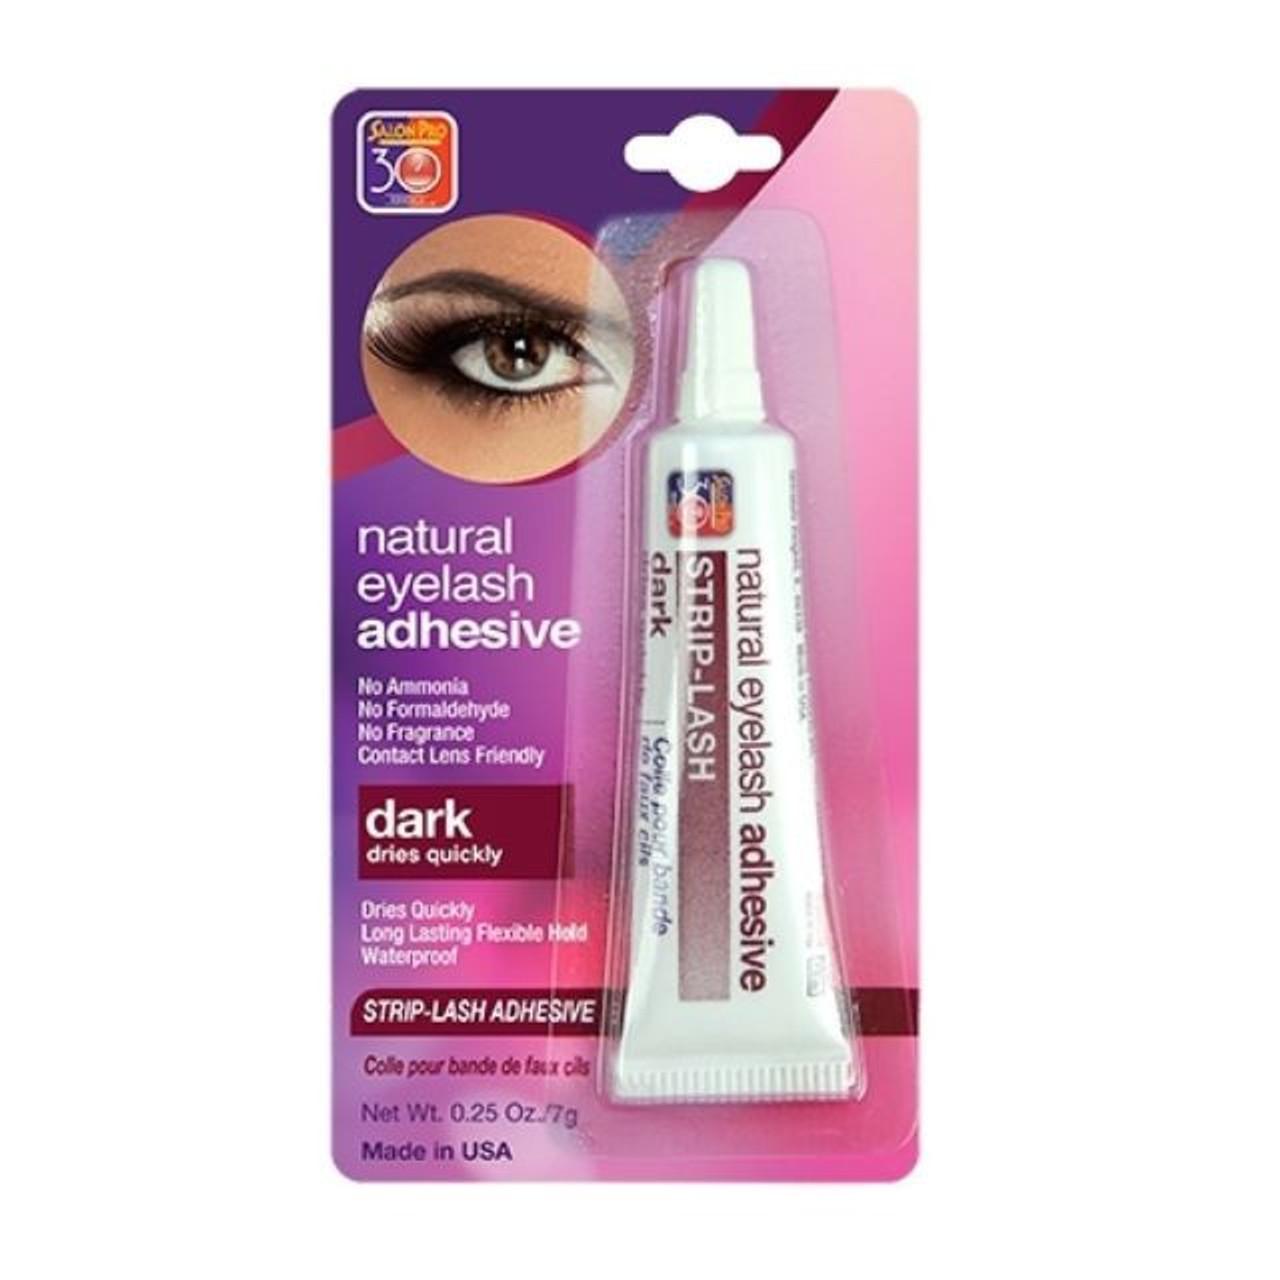 de3bd186887 Salon Pro 30 Sec Natural Eyelash Adhesive Strip Lash Glue 0.25 oz.